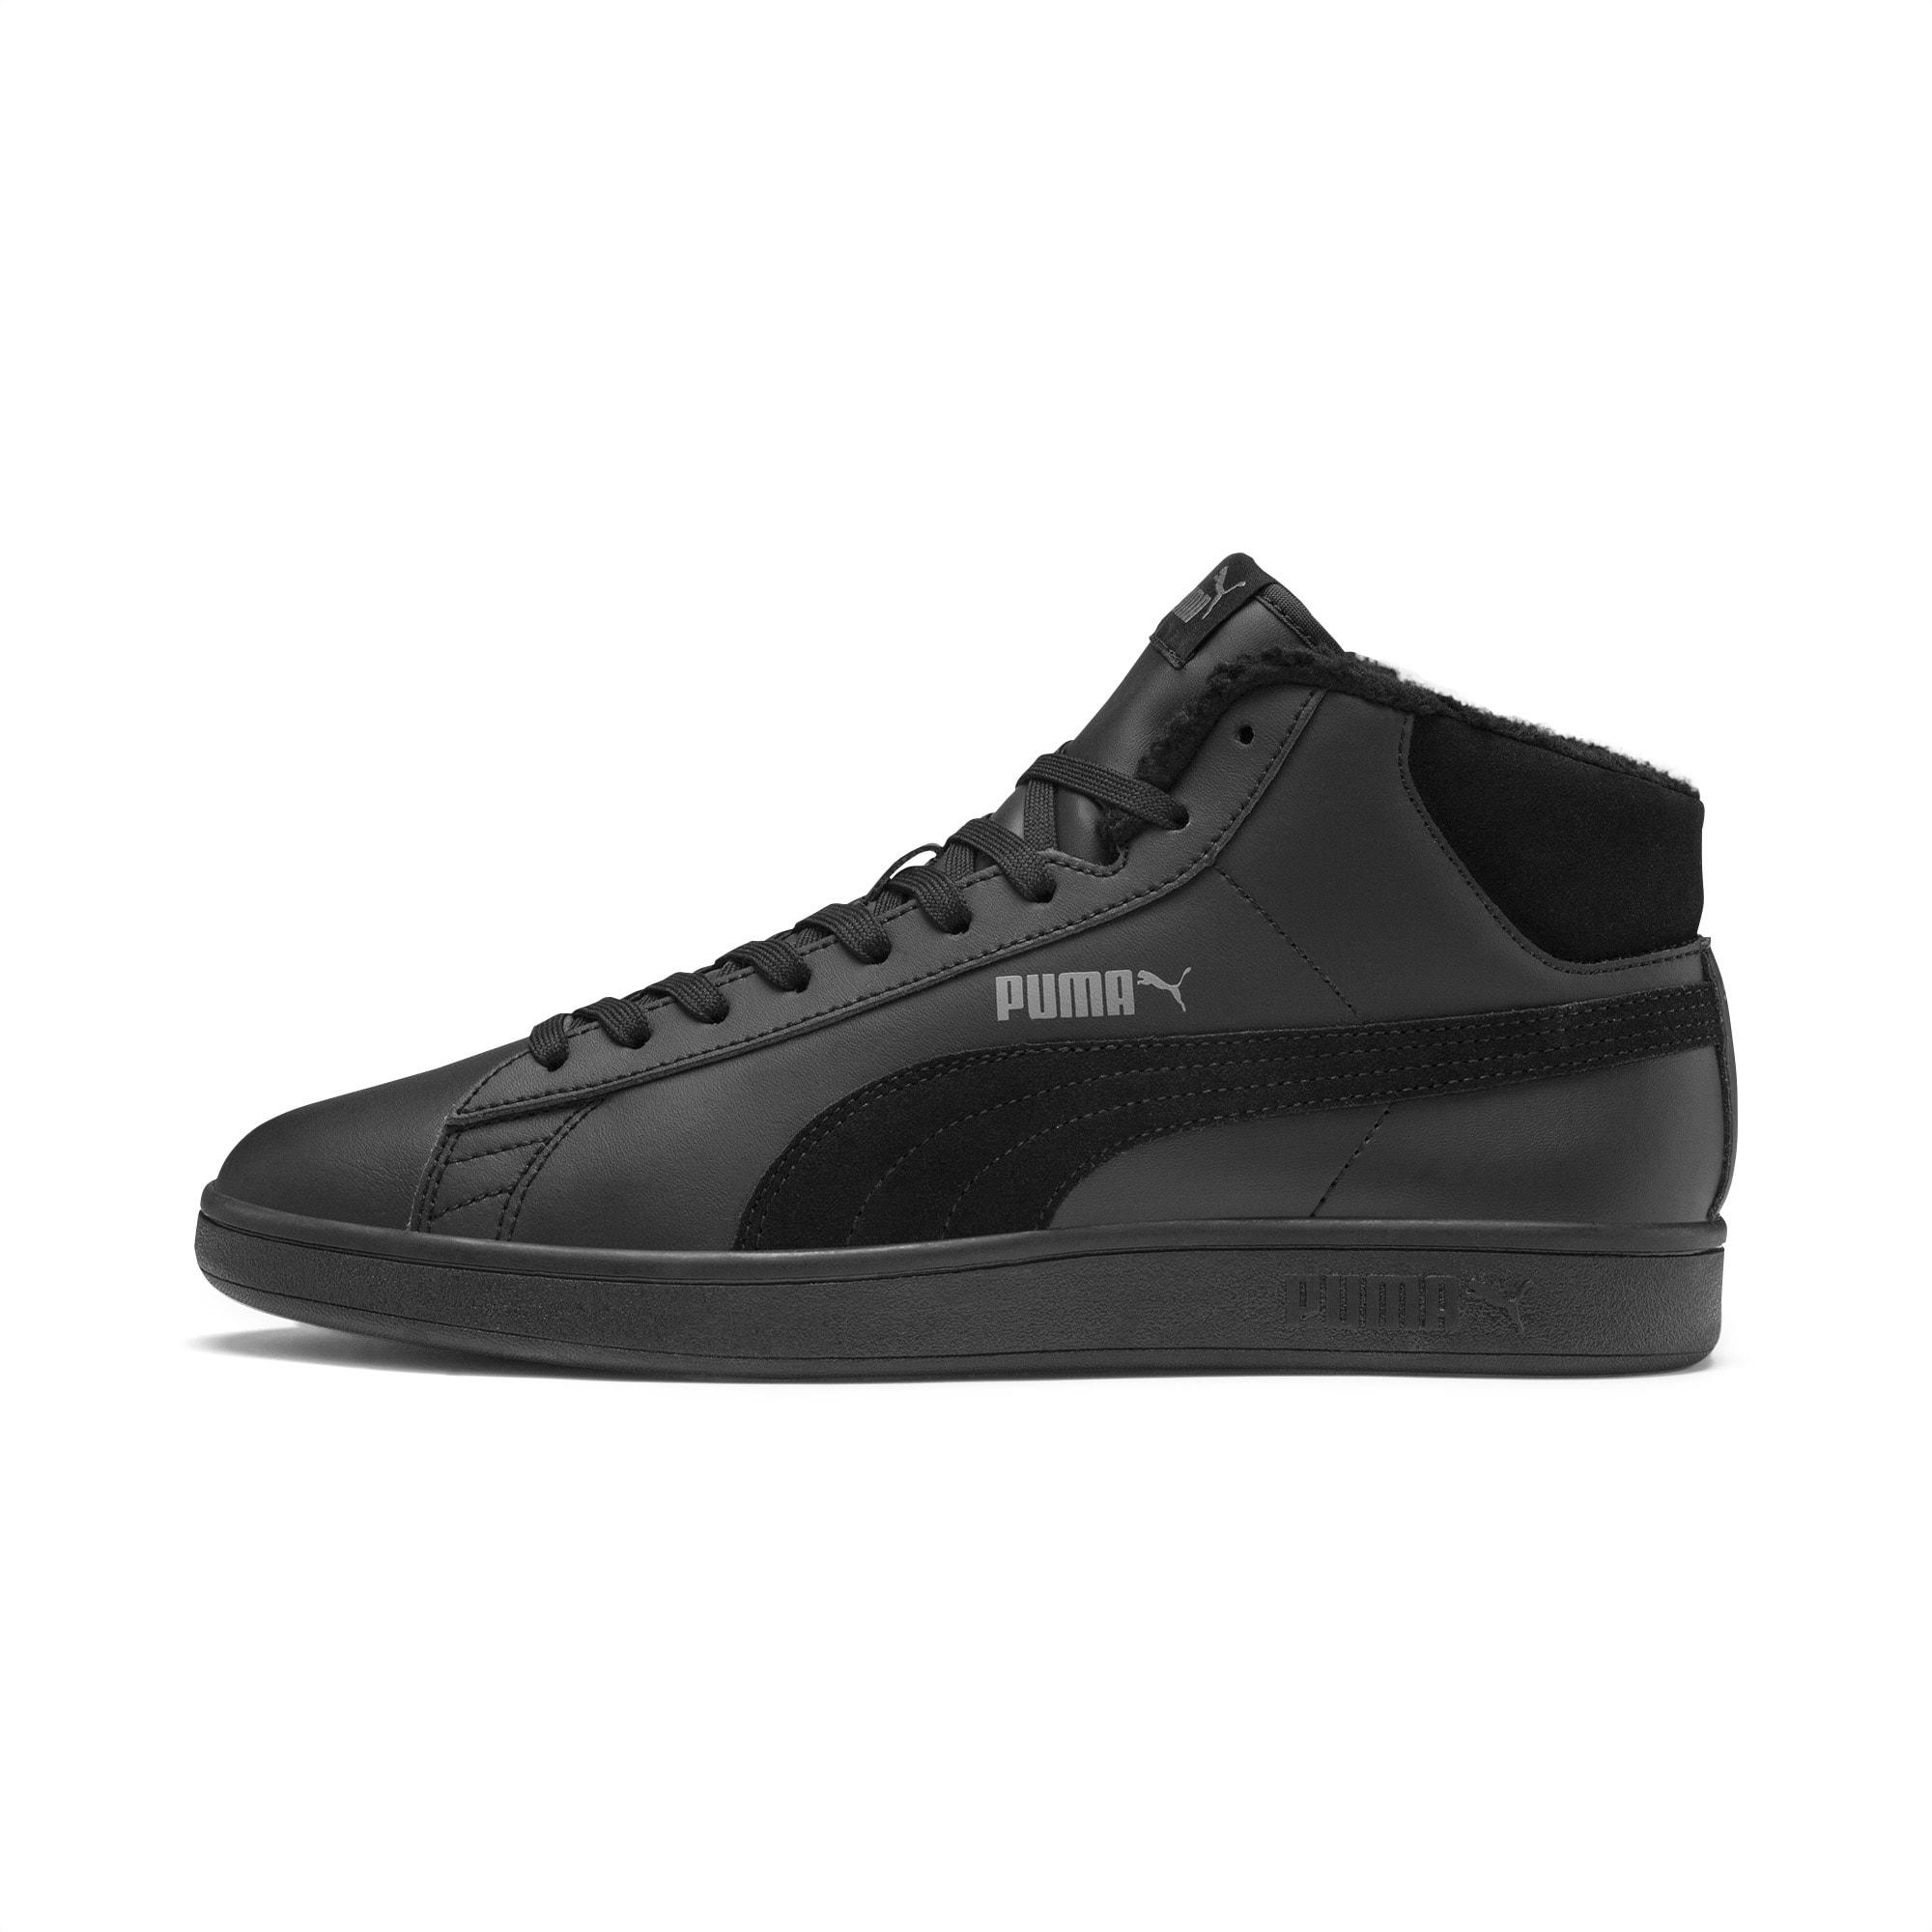 Puma Men's Smash Leather Shoe